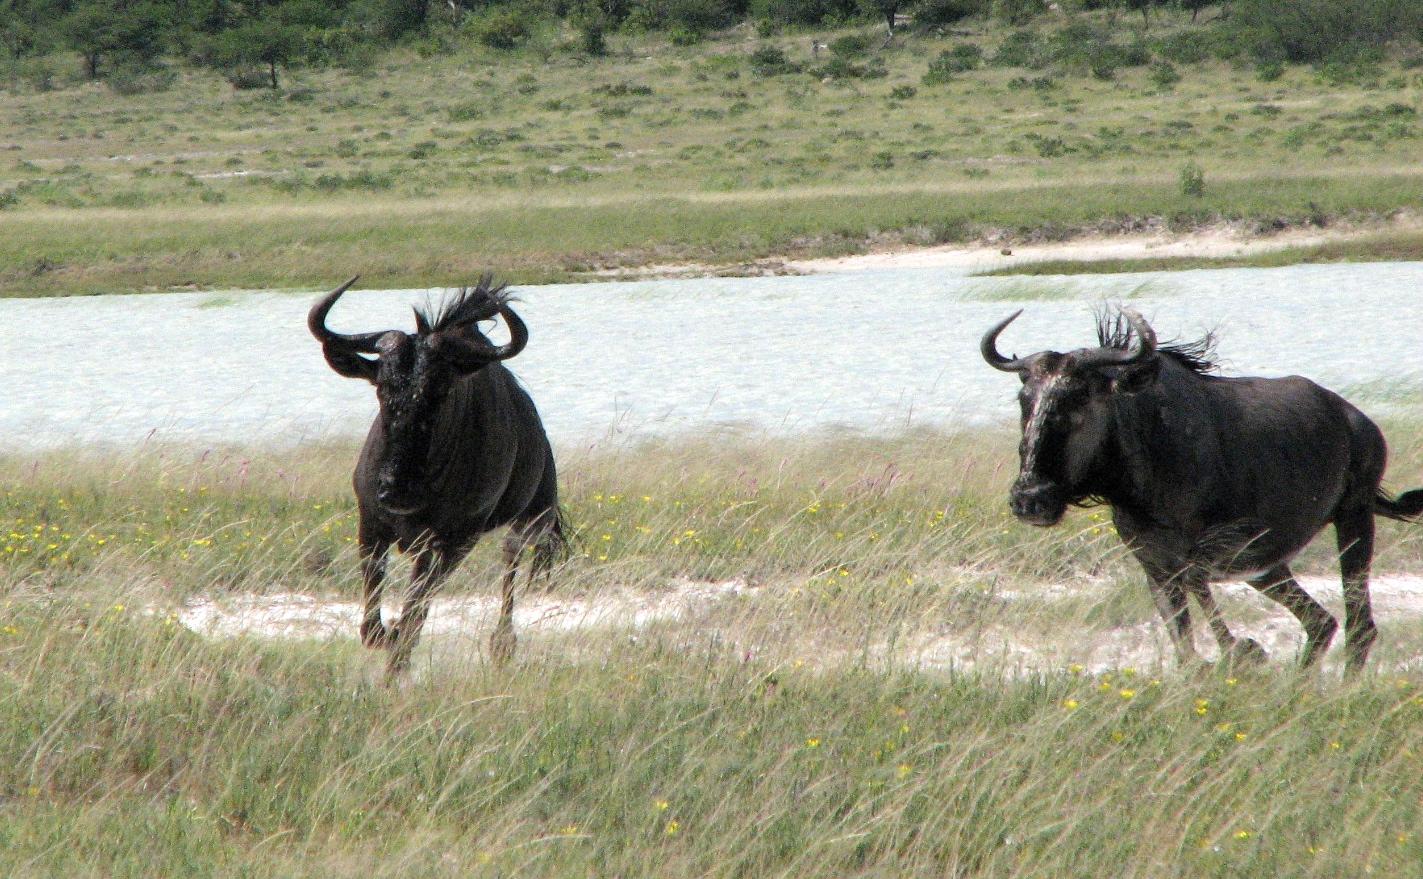 Estosha National Park